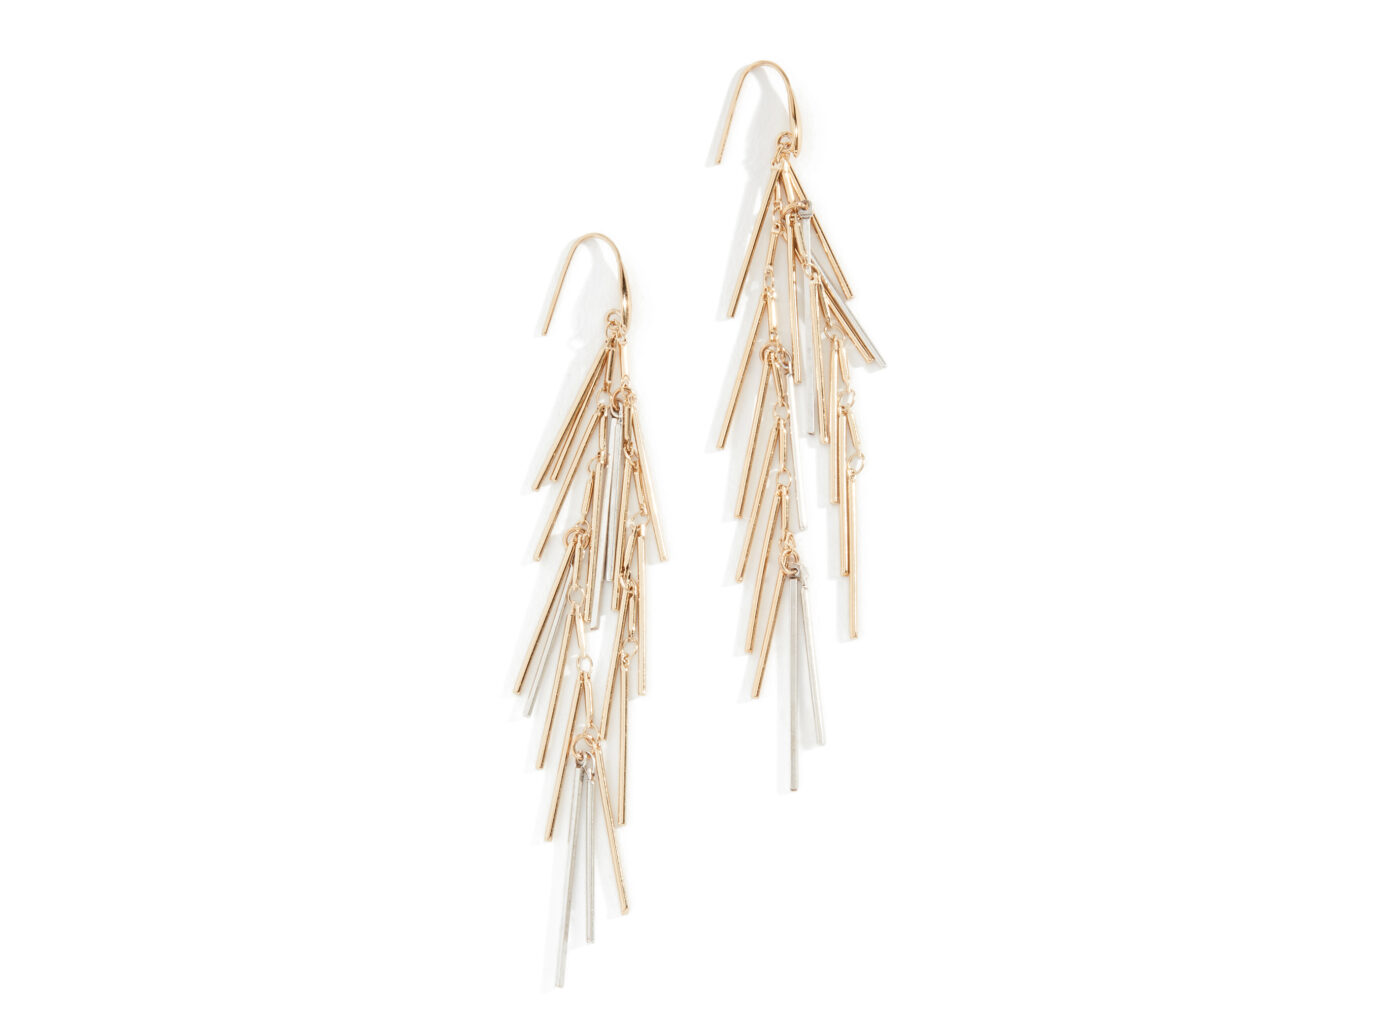 Isabel Marant Good Swung Earrings